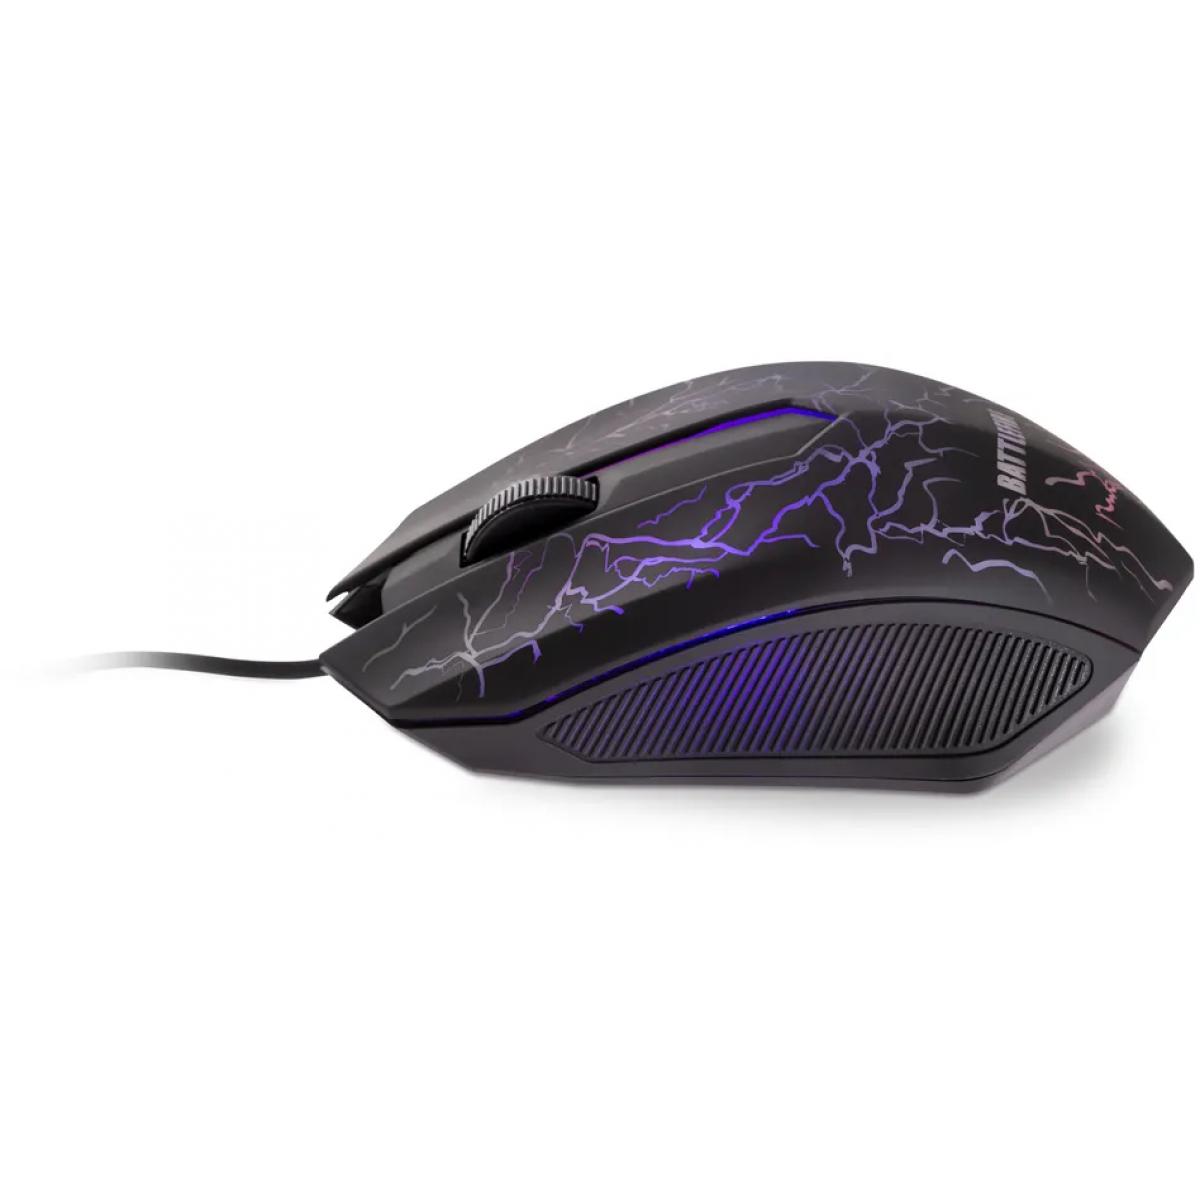 Combo Gamer Dazz Battlefire Revolution, Teclado e Mouse, 625021